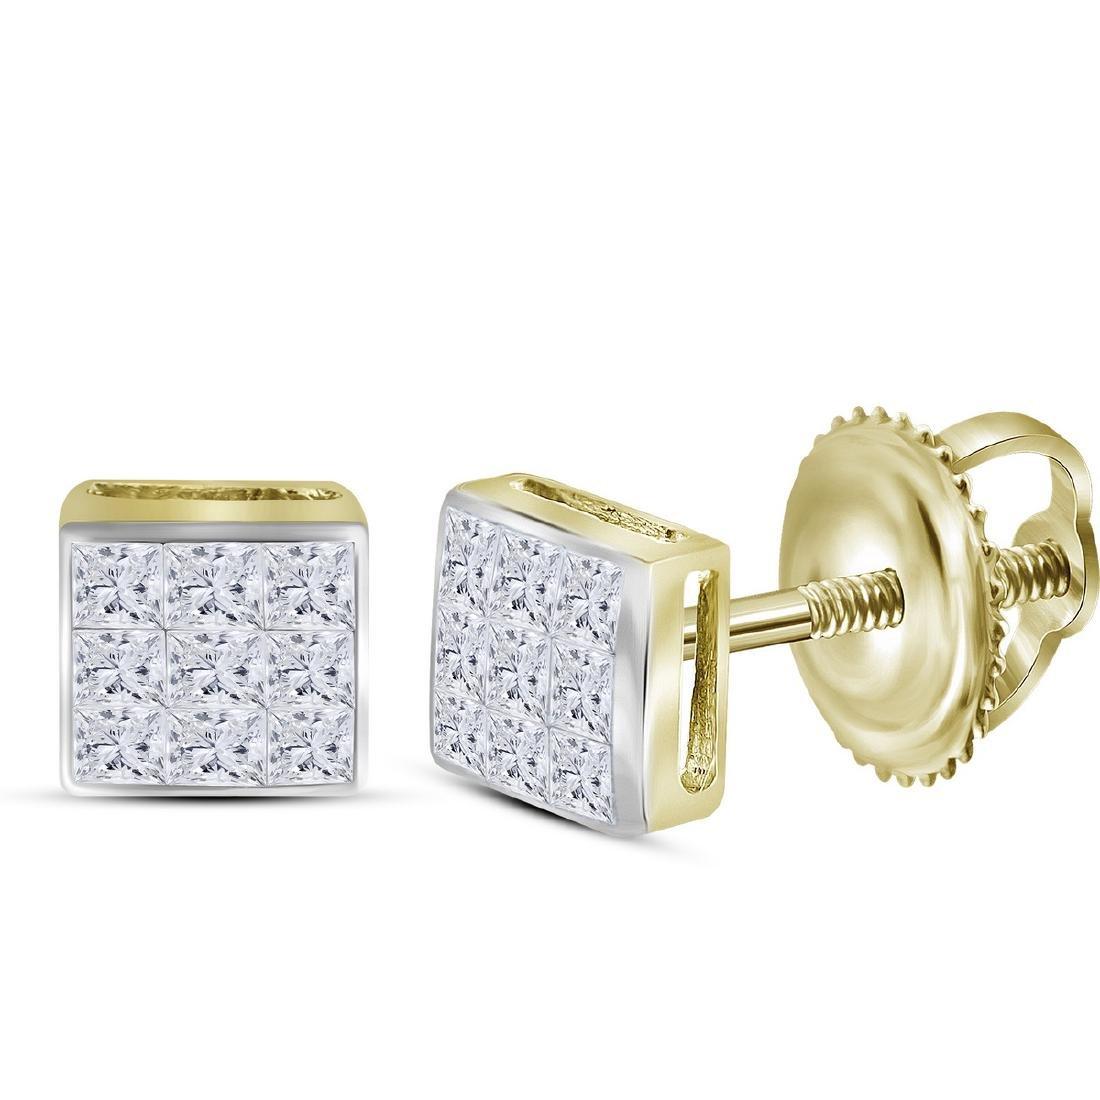 0.24 CTW Princess Diamond Square Cluster Stud Earrings